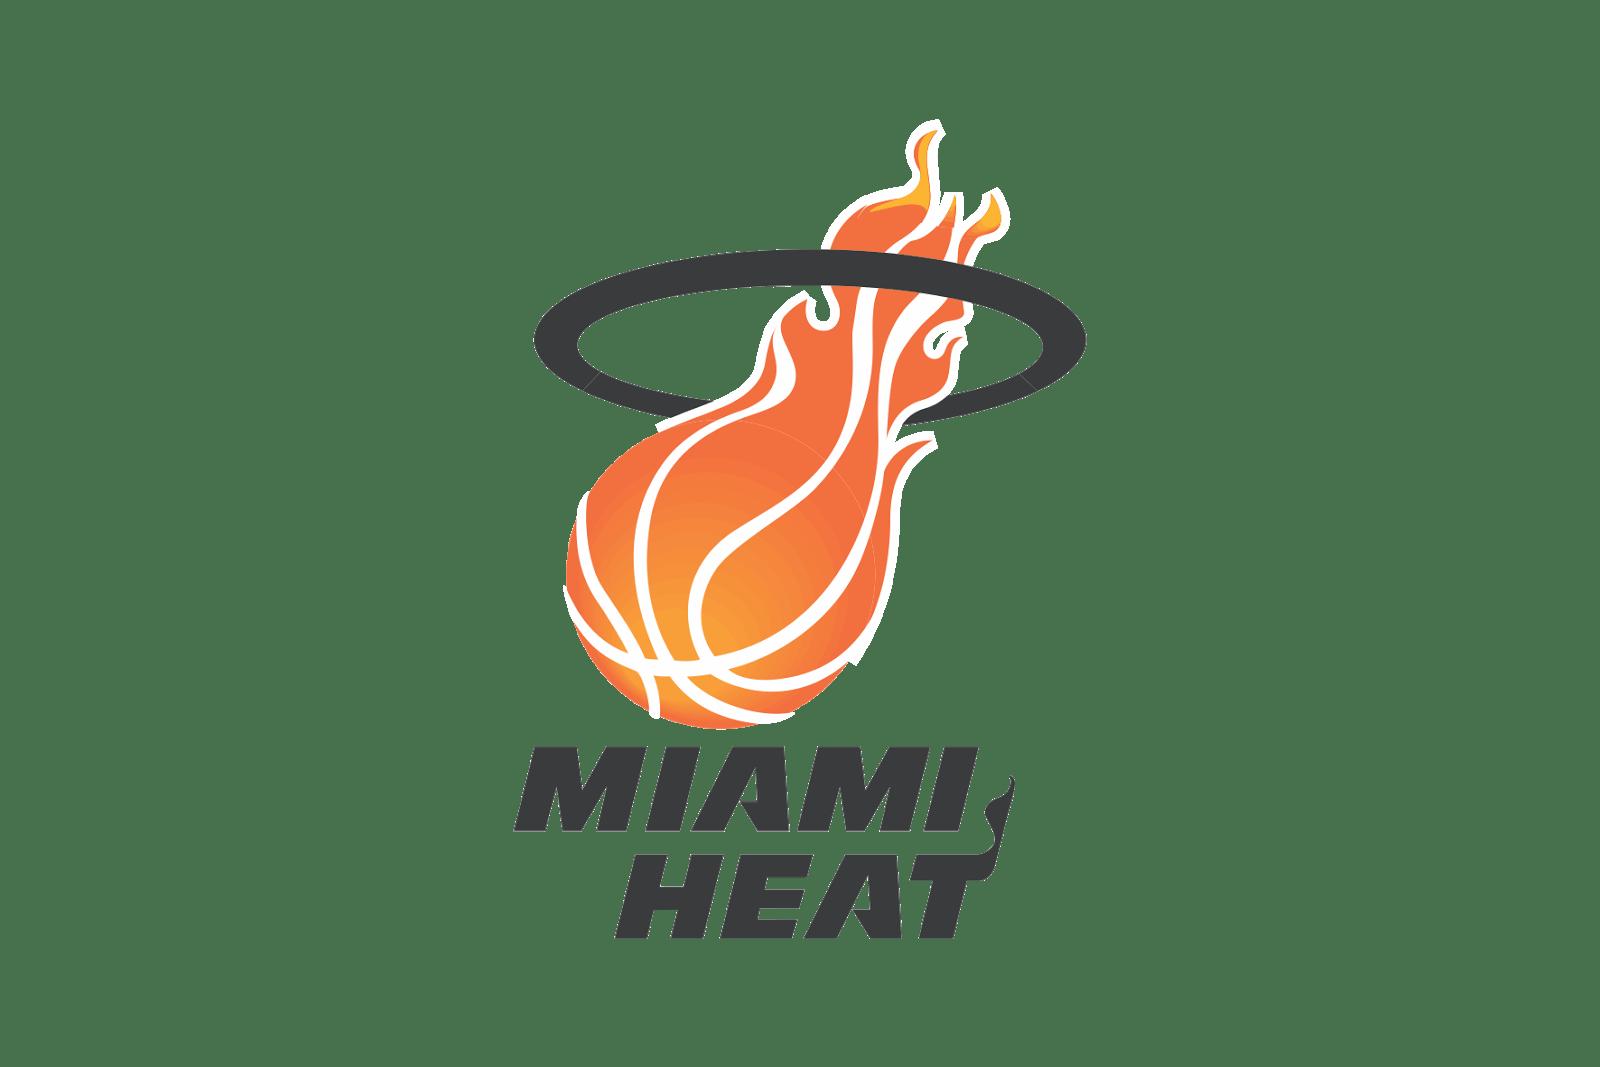 Heat clipart uses heat. Miami logo transparent png